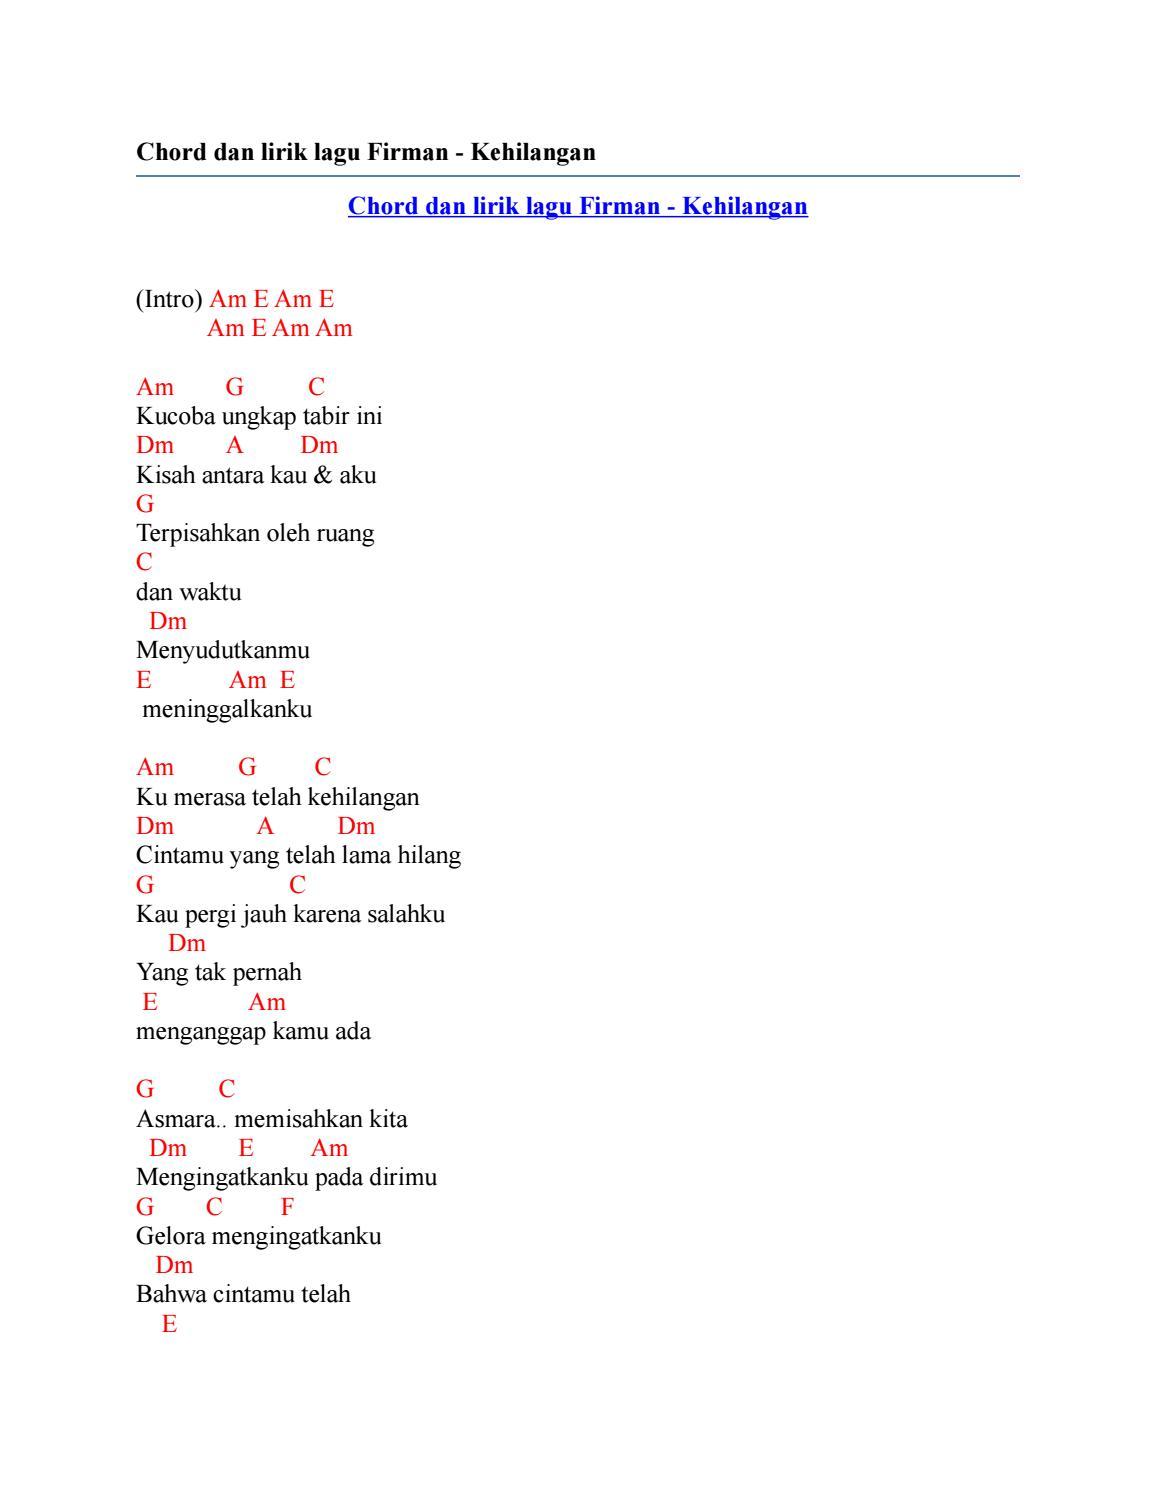 Chord Lagu Firman Kehilangan : chord, firman, kehilangan, Chord, Lirik, Firman, Kehilangan, Issuu